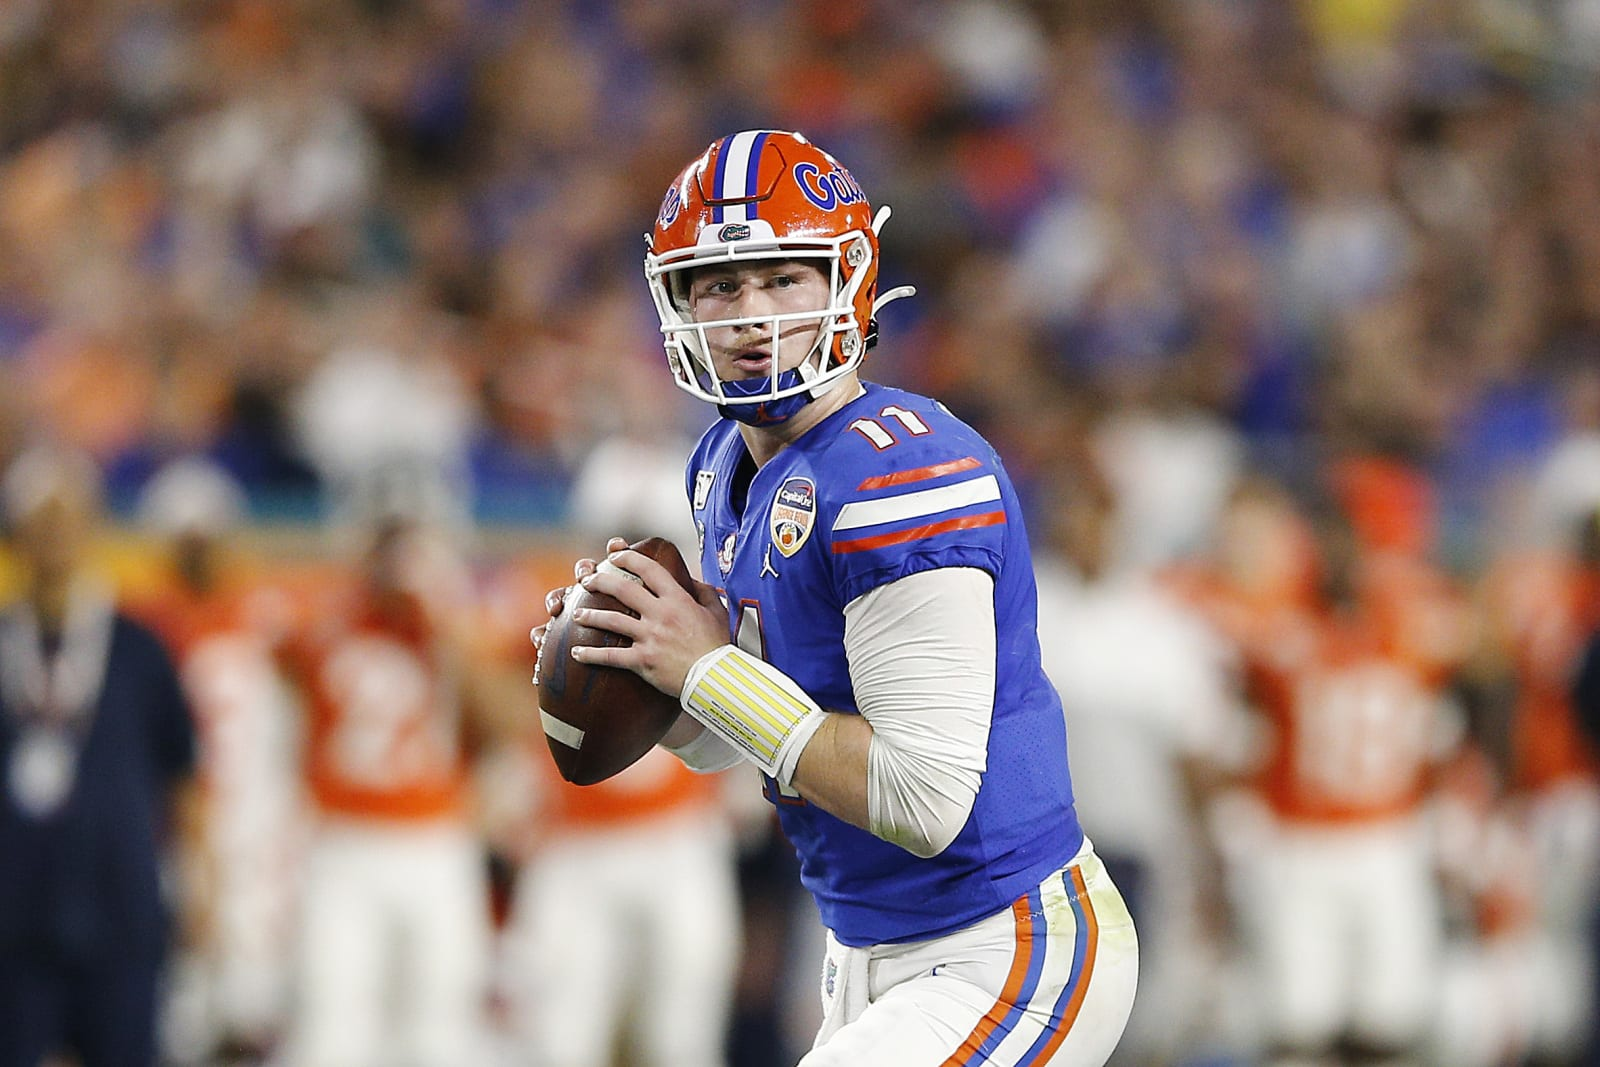 2021 nfl draft analyzing quarterbacks on the senior bowl